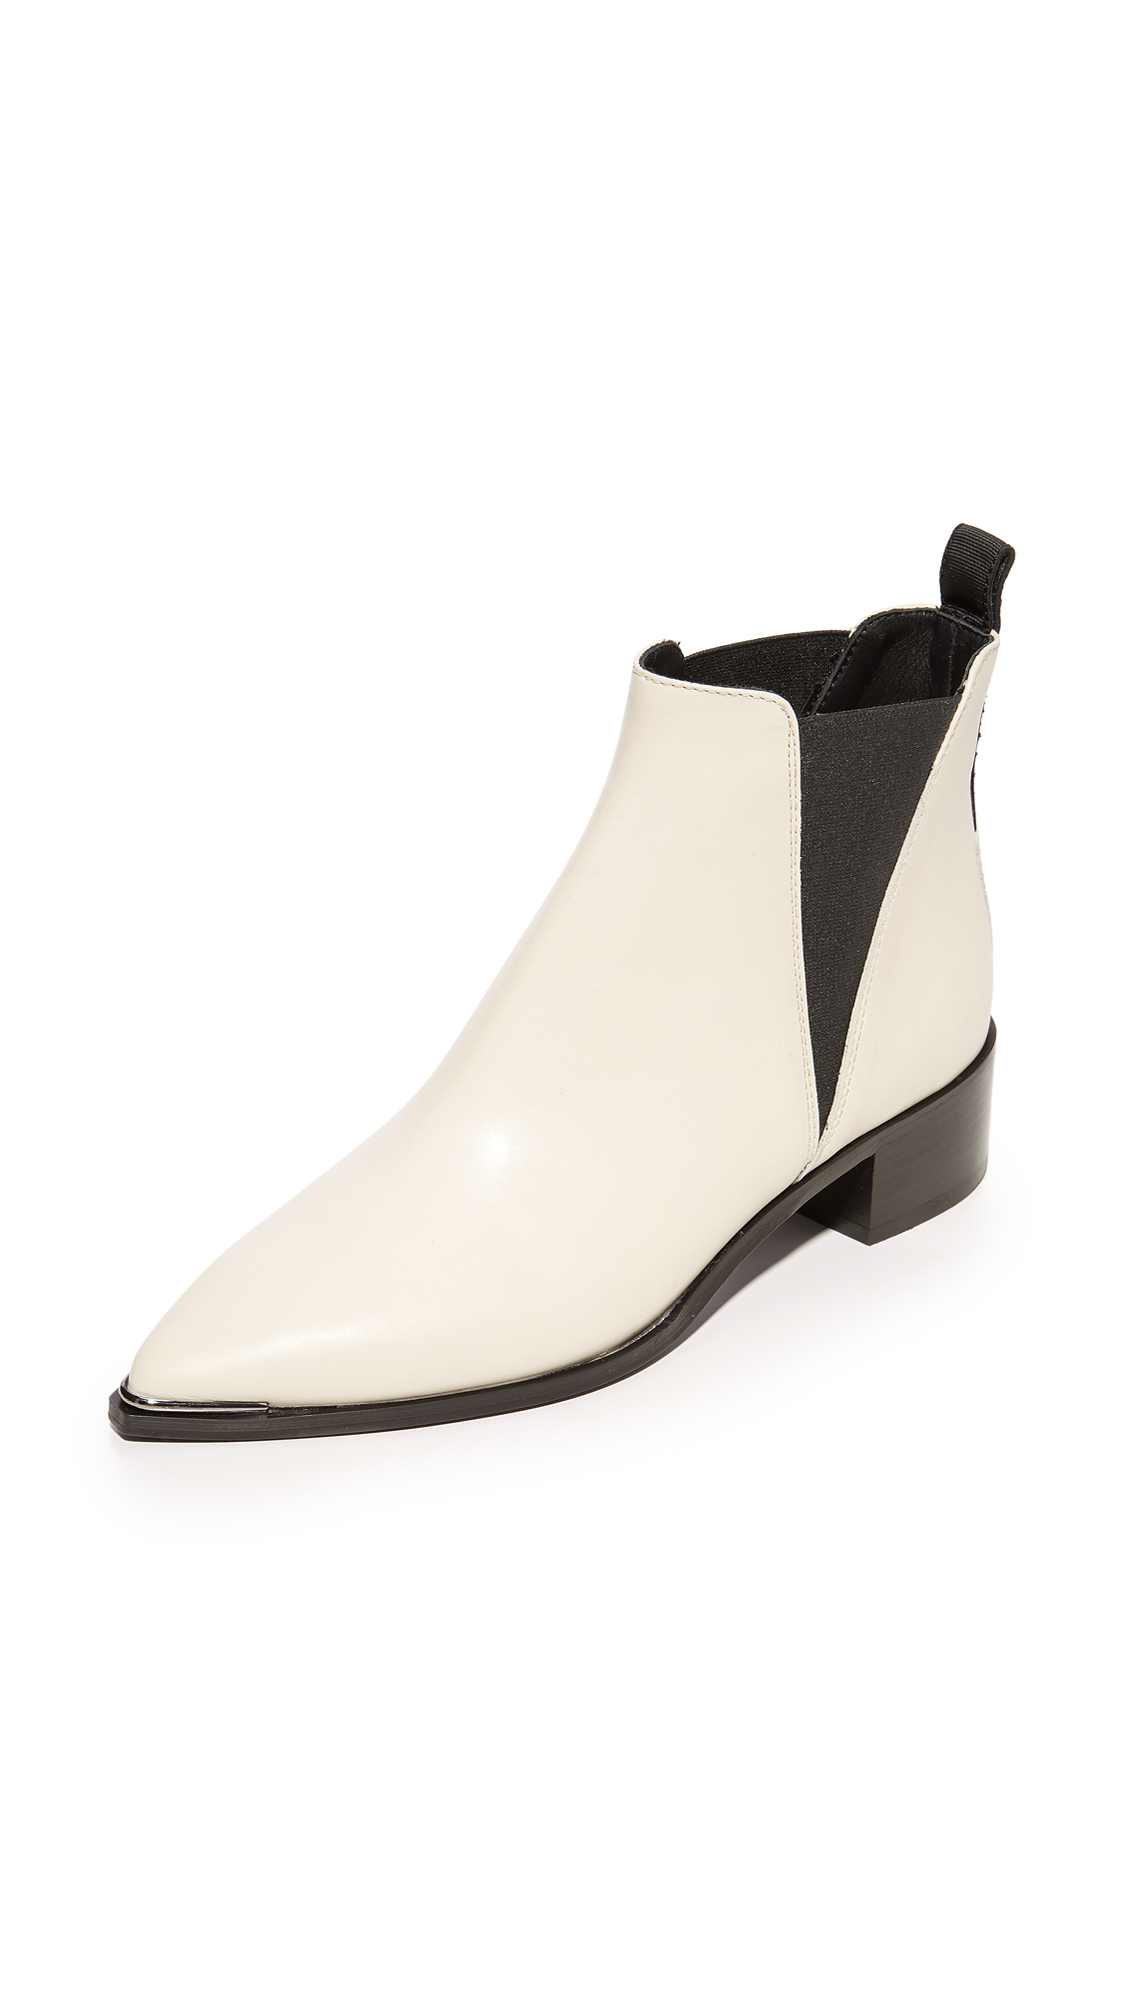 Acne Studios Jensen Chelsea Boots - Off White